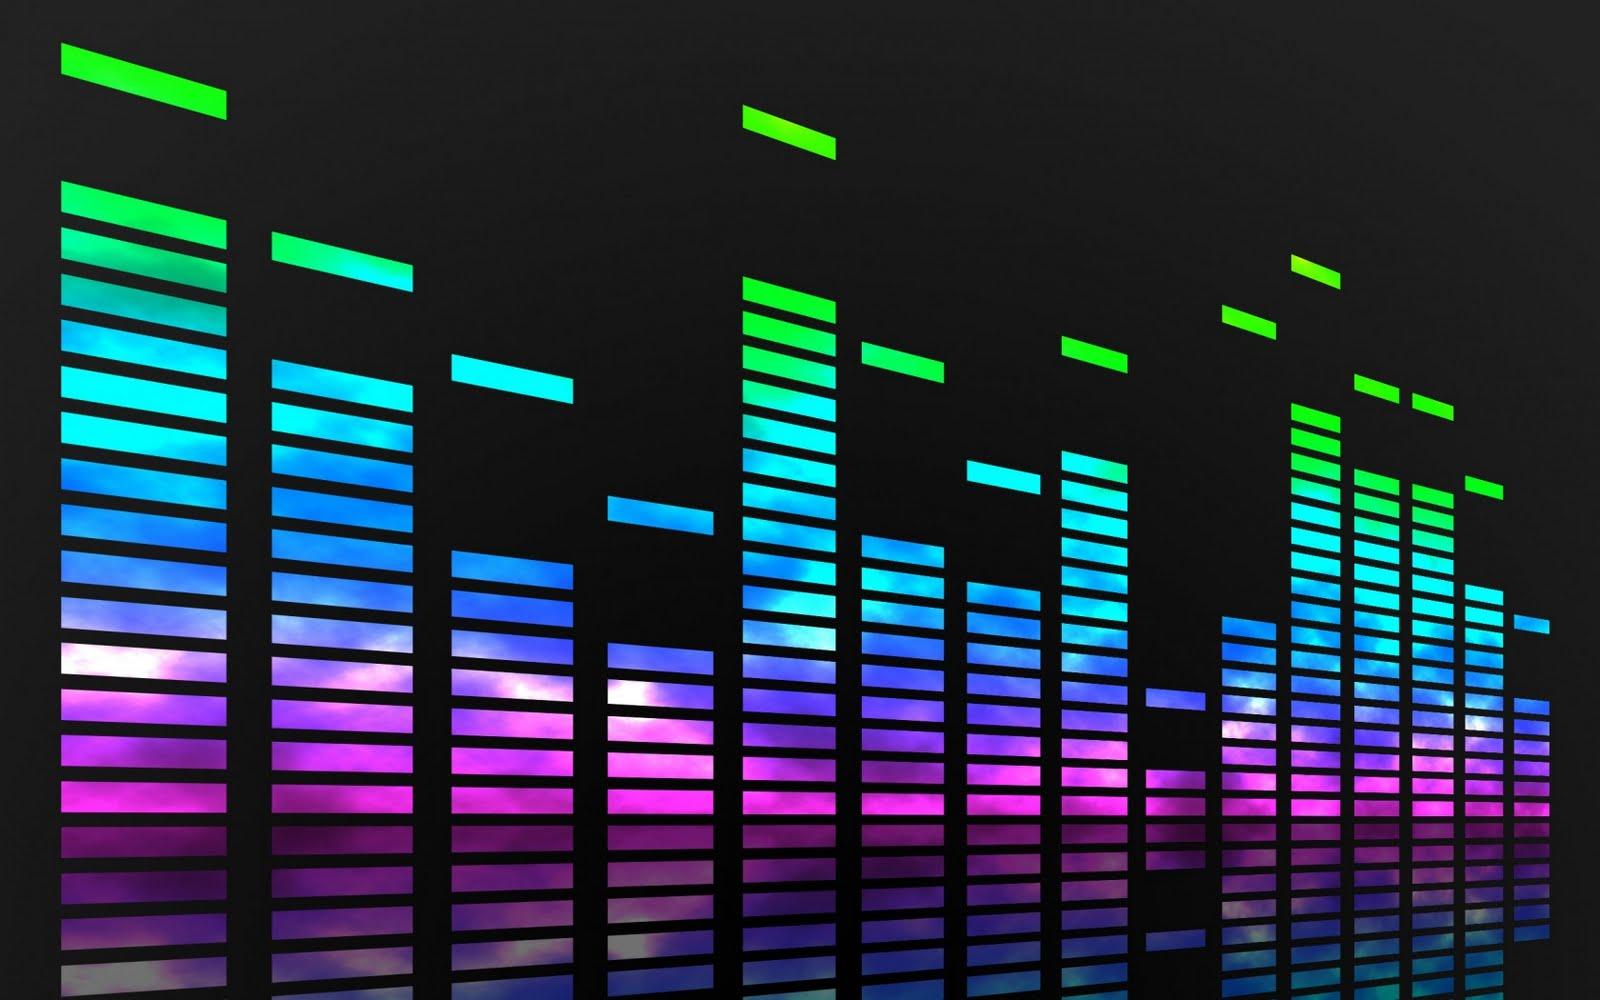 audio peak indicator sensor signal information processing sensip